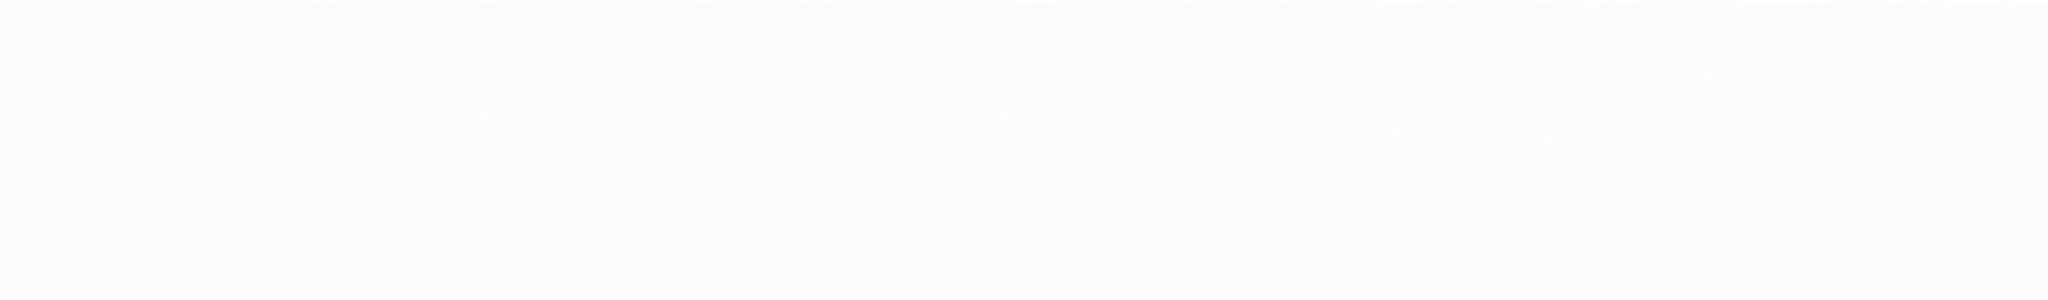 HU 101264 bordo in ABS bianco artico liscio lucido 90°